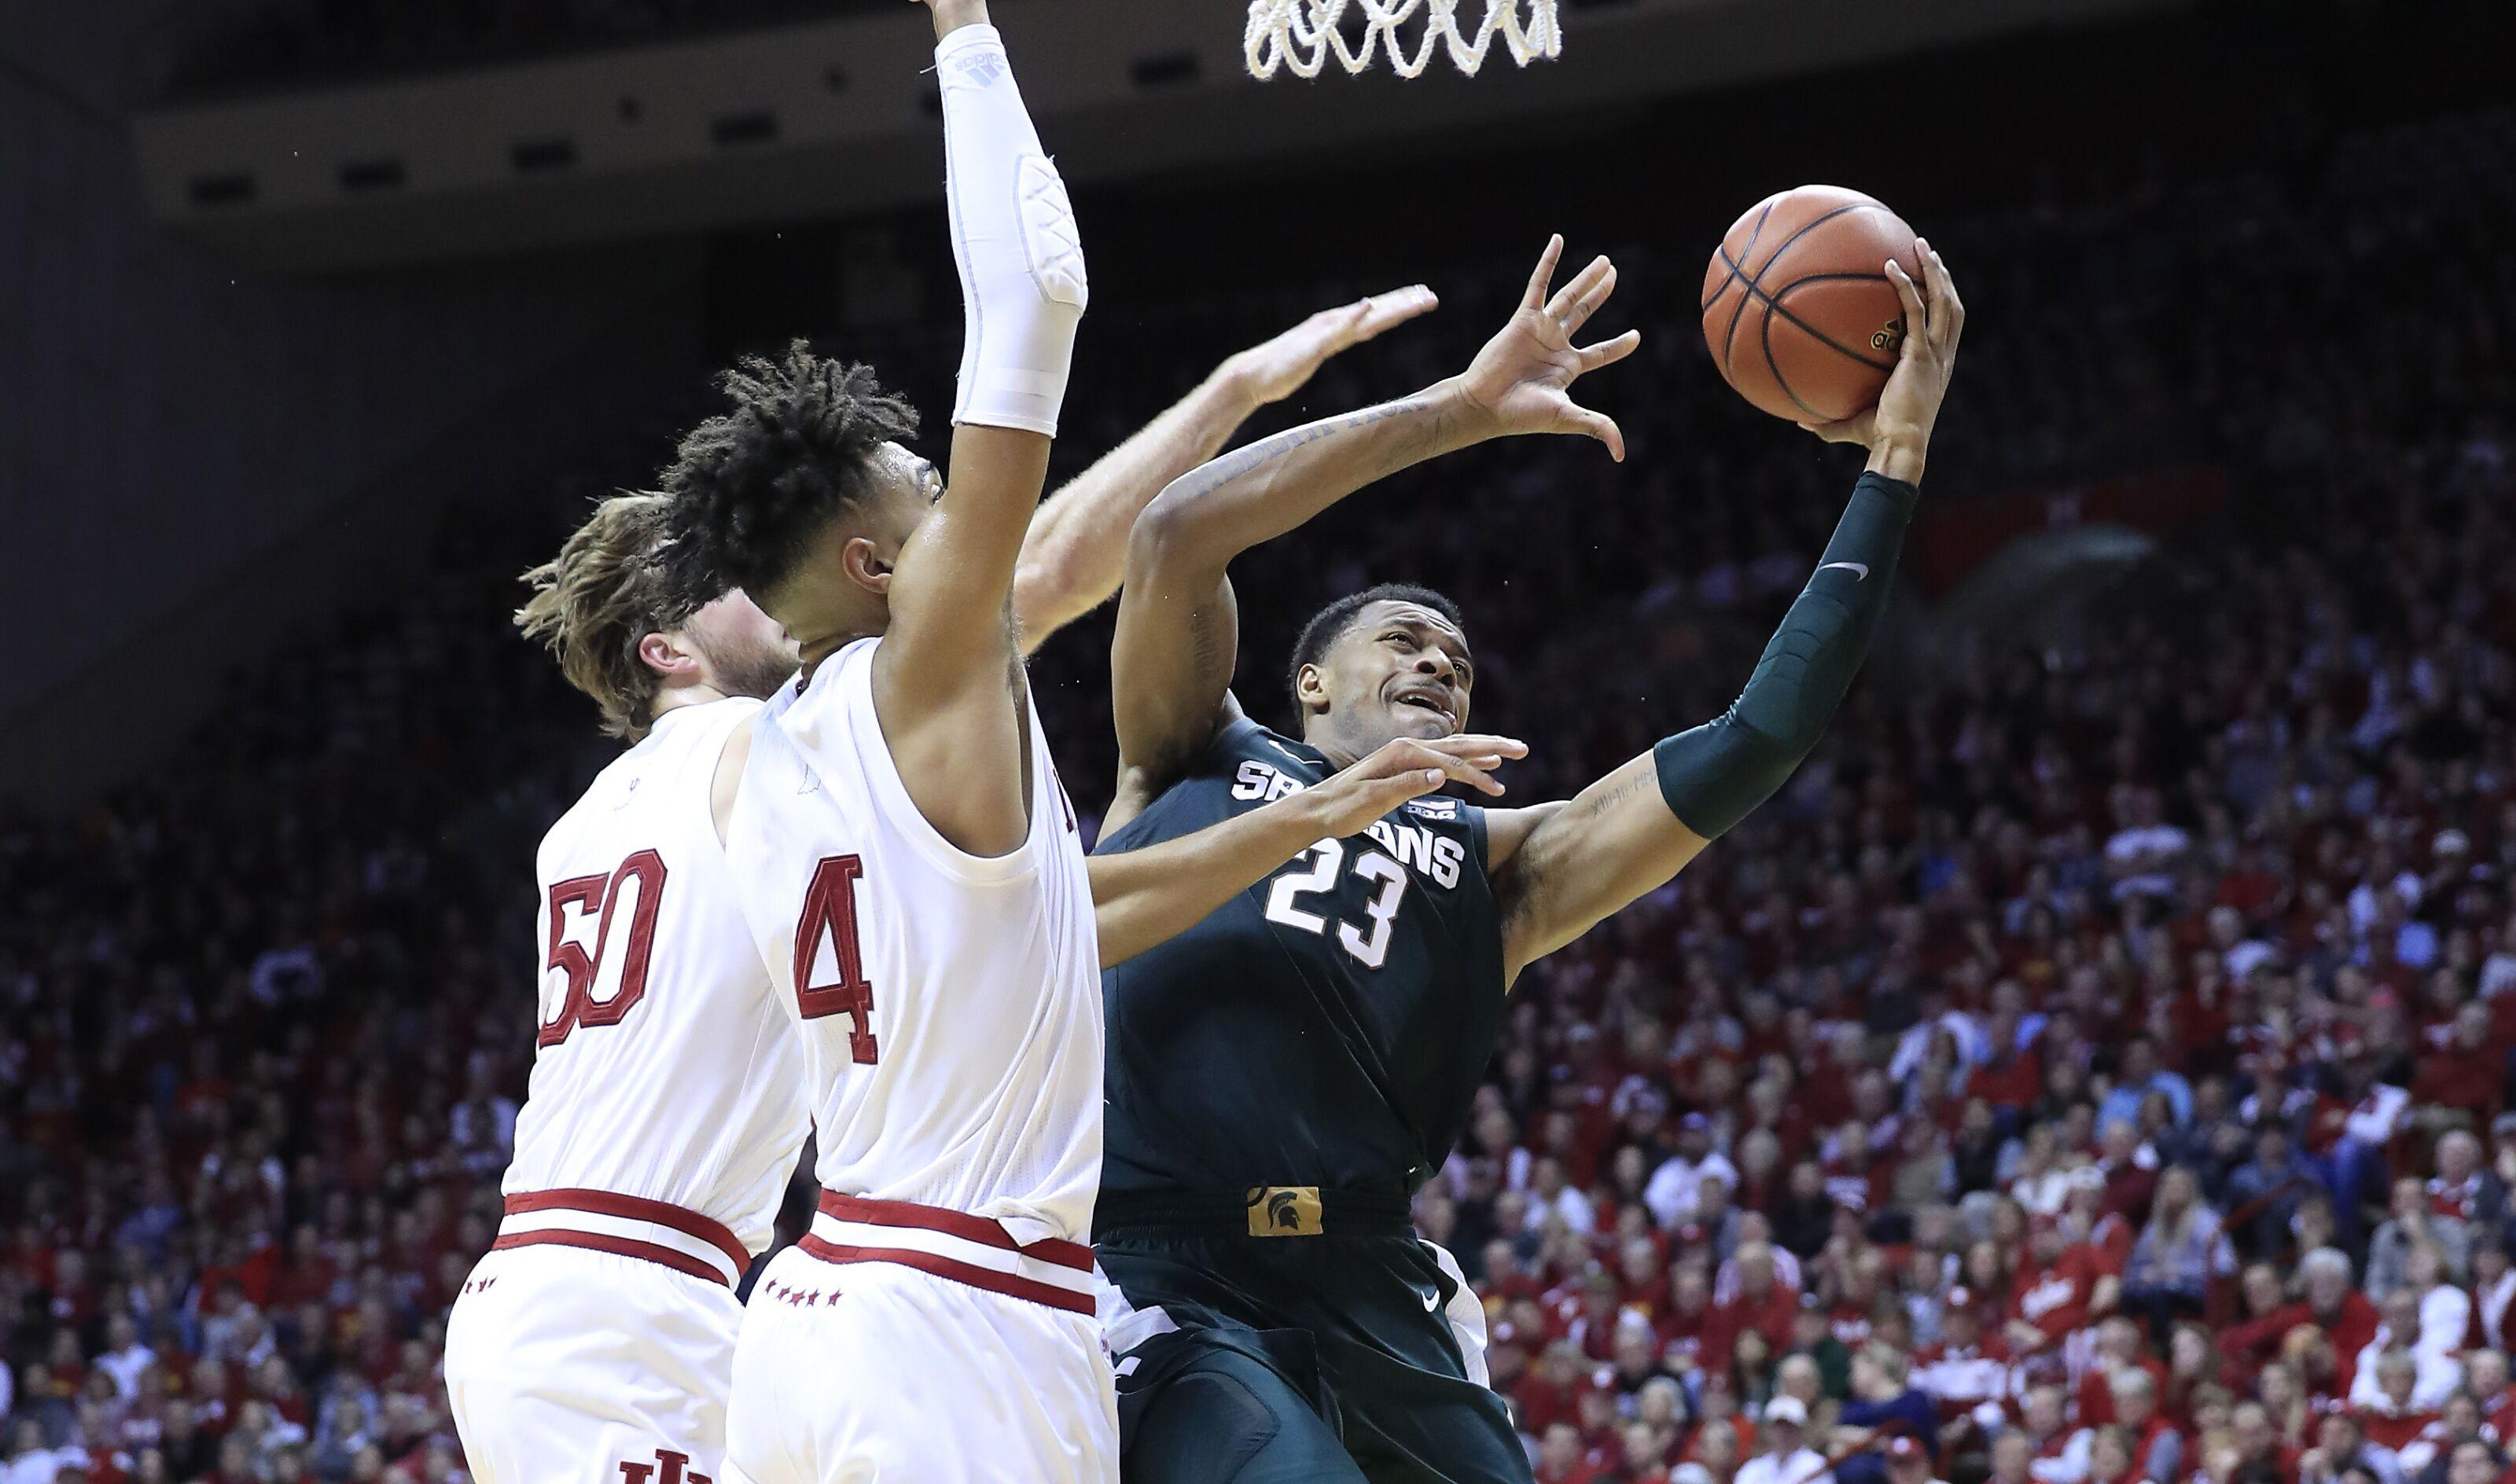 Michigan State Basketball: Sense of urgency needed at Minnesota